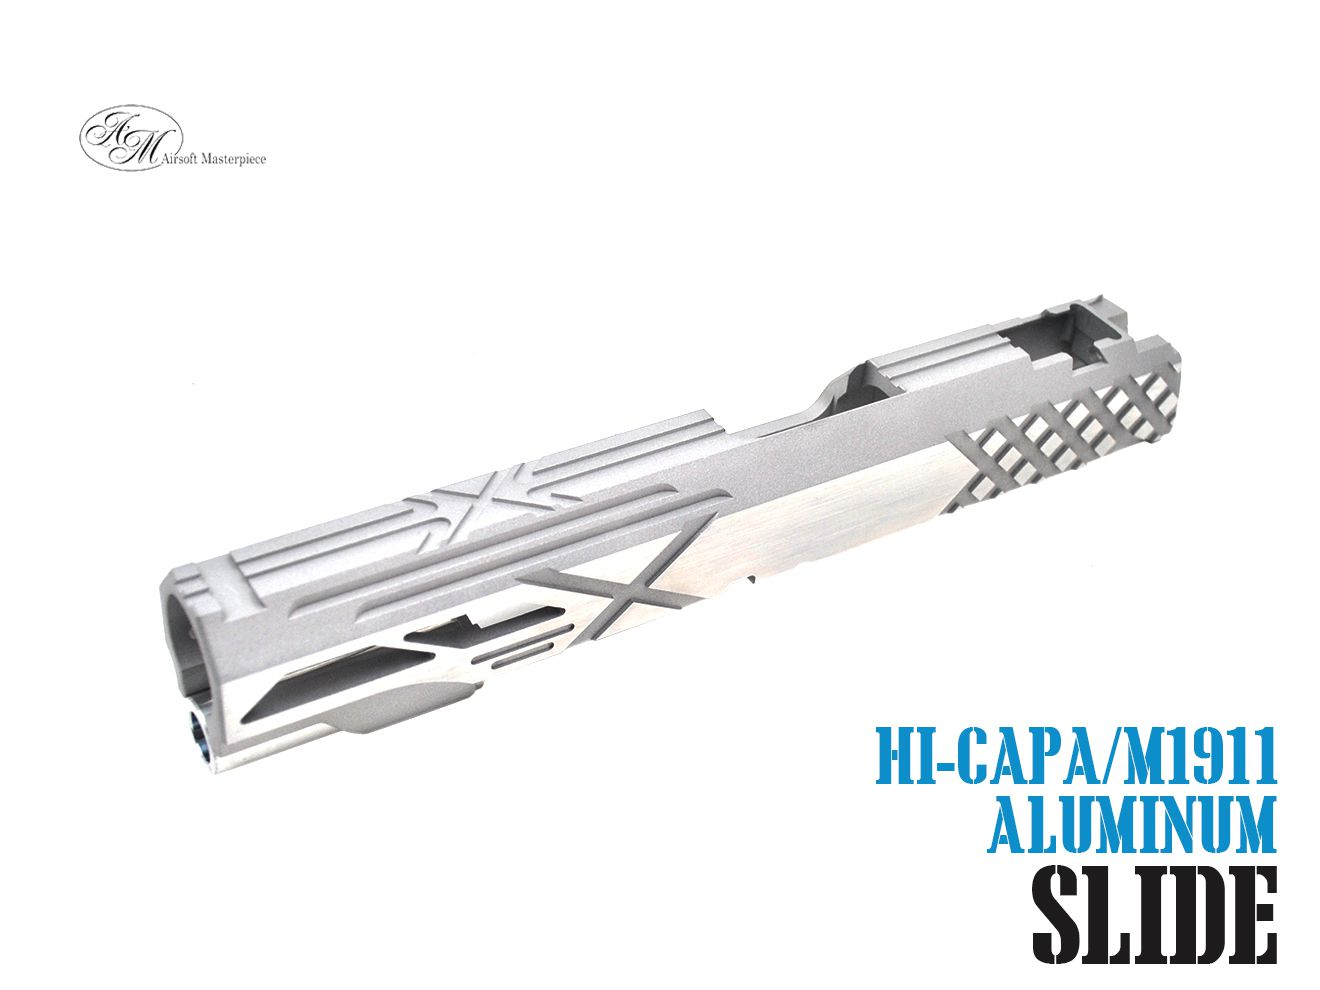 Airsoft Masterpiece Custom X2 スタンダード スライド For TM Hi-Capa/1911 GBB SV★銀 シルバー マスターピース Hi-CAPA M1911 ハンドガン